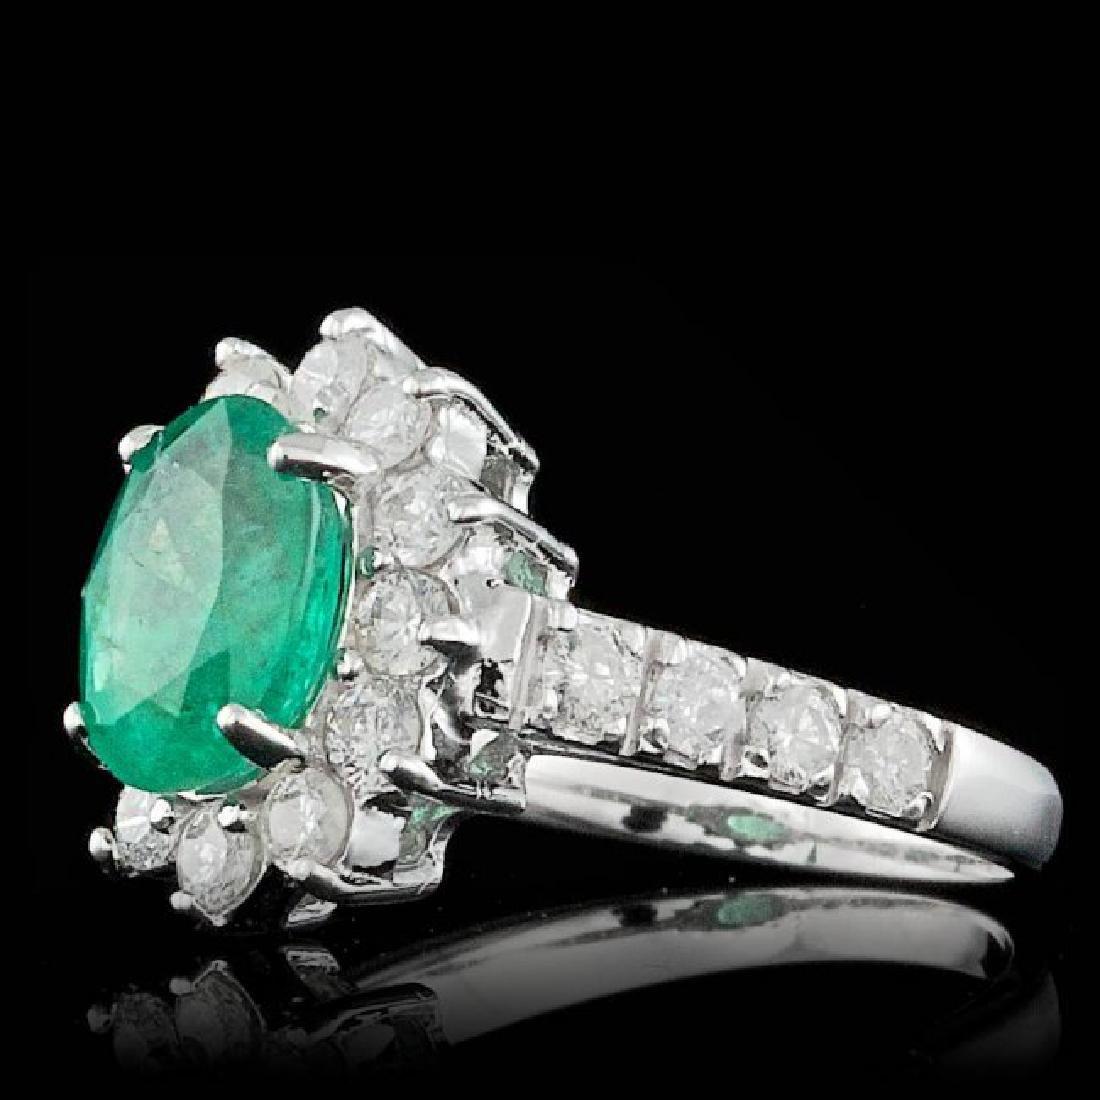 14k White Gold 1.70ct Emerald 0.90ct Diamond Ring - 2